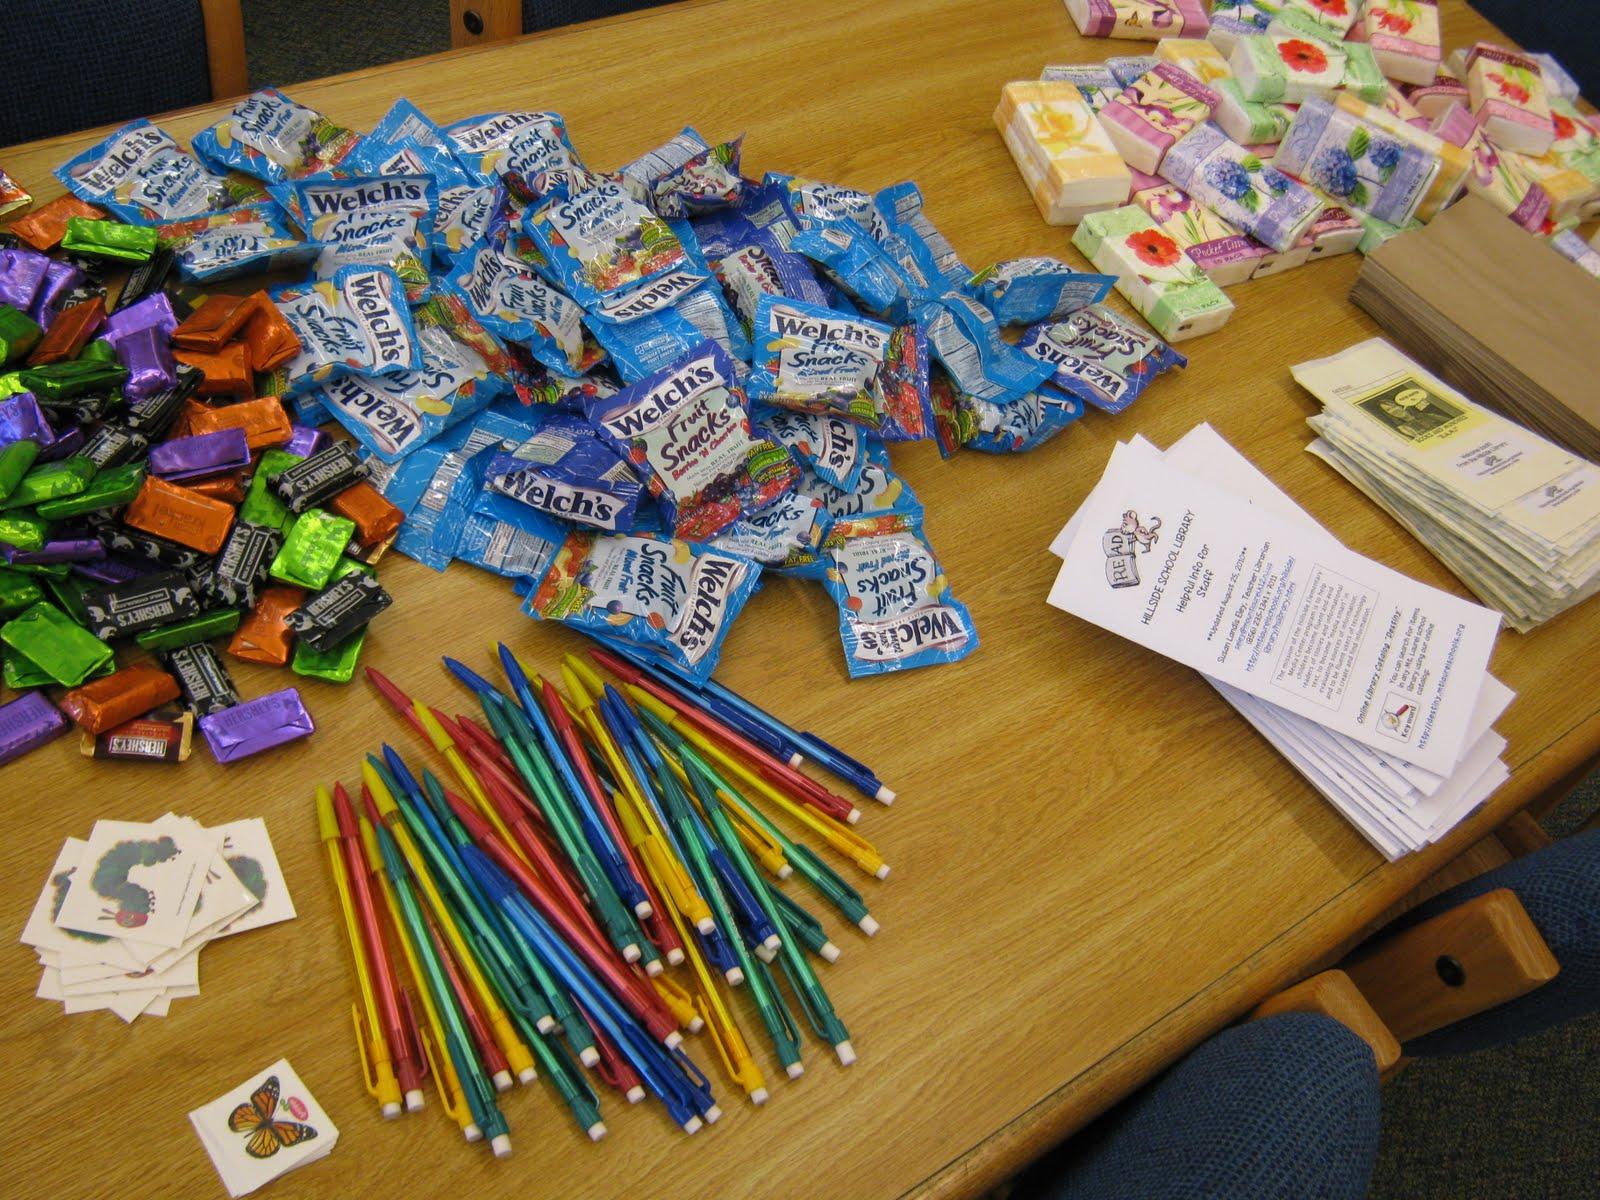 Hillside Elementary School Library Welcome Back Teacher